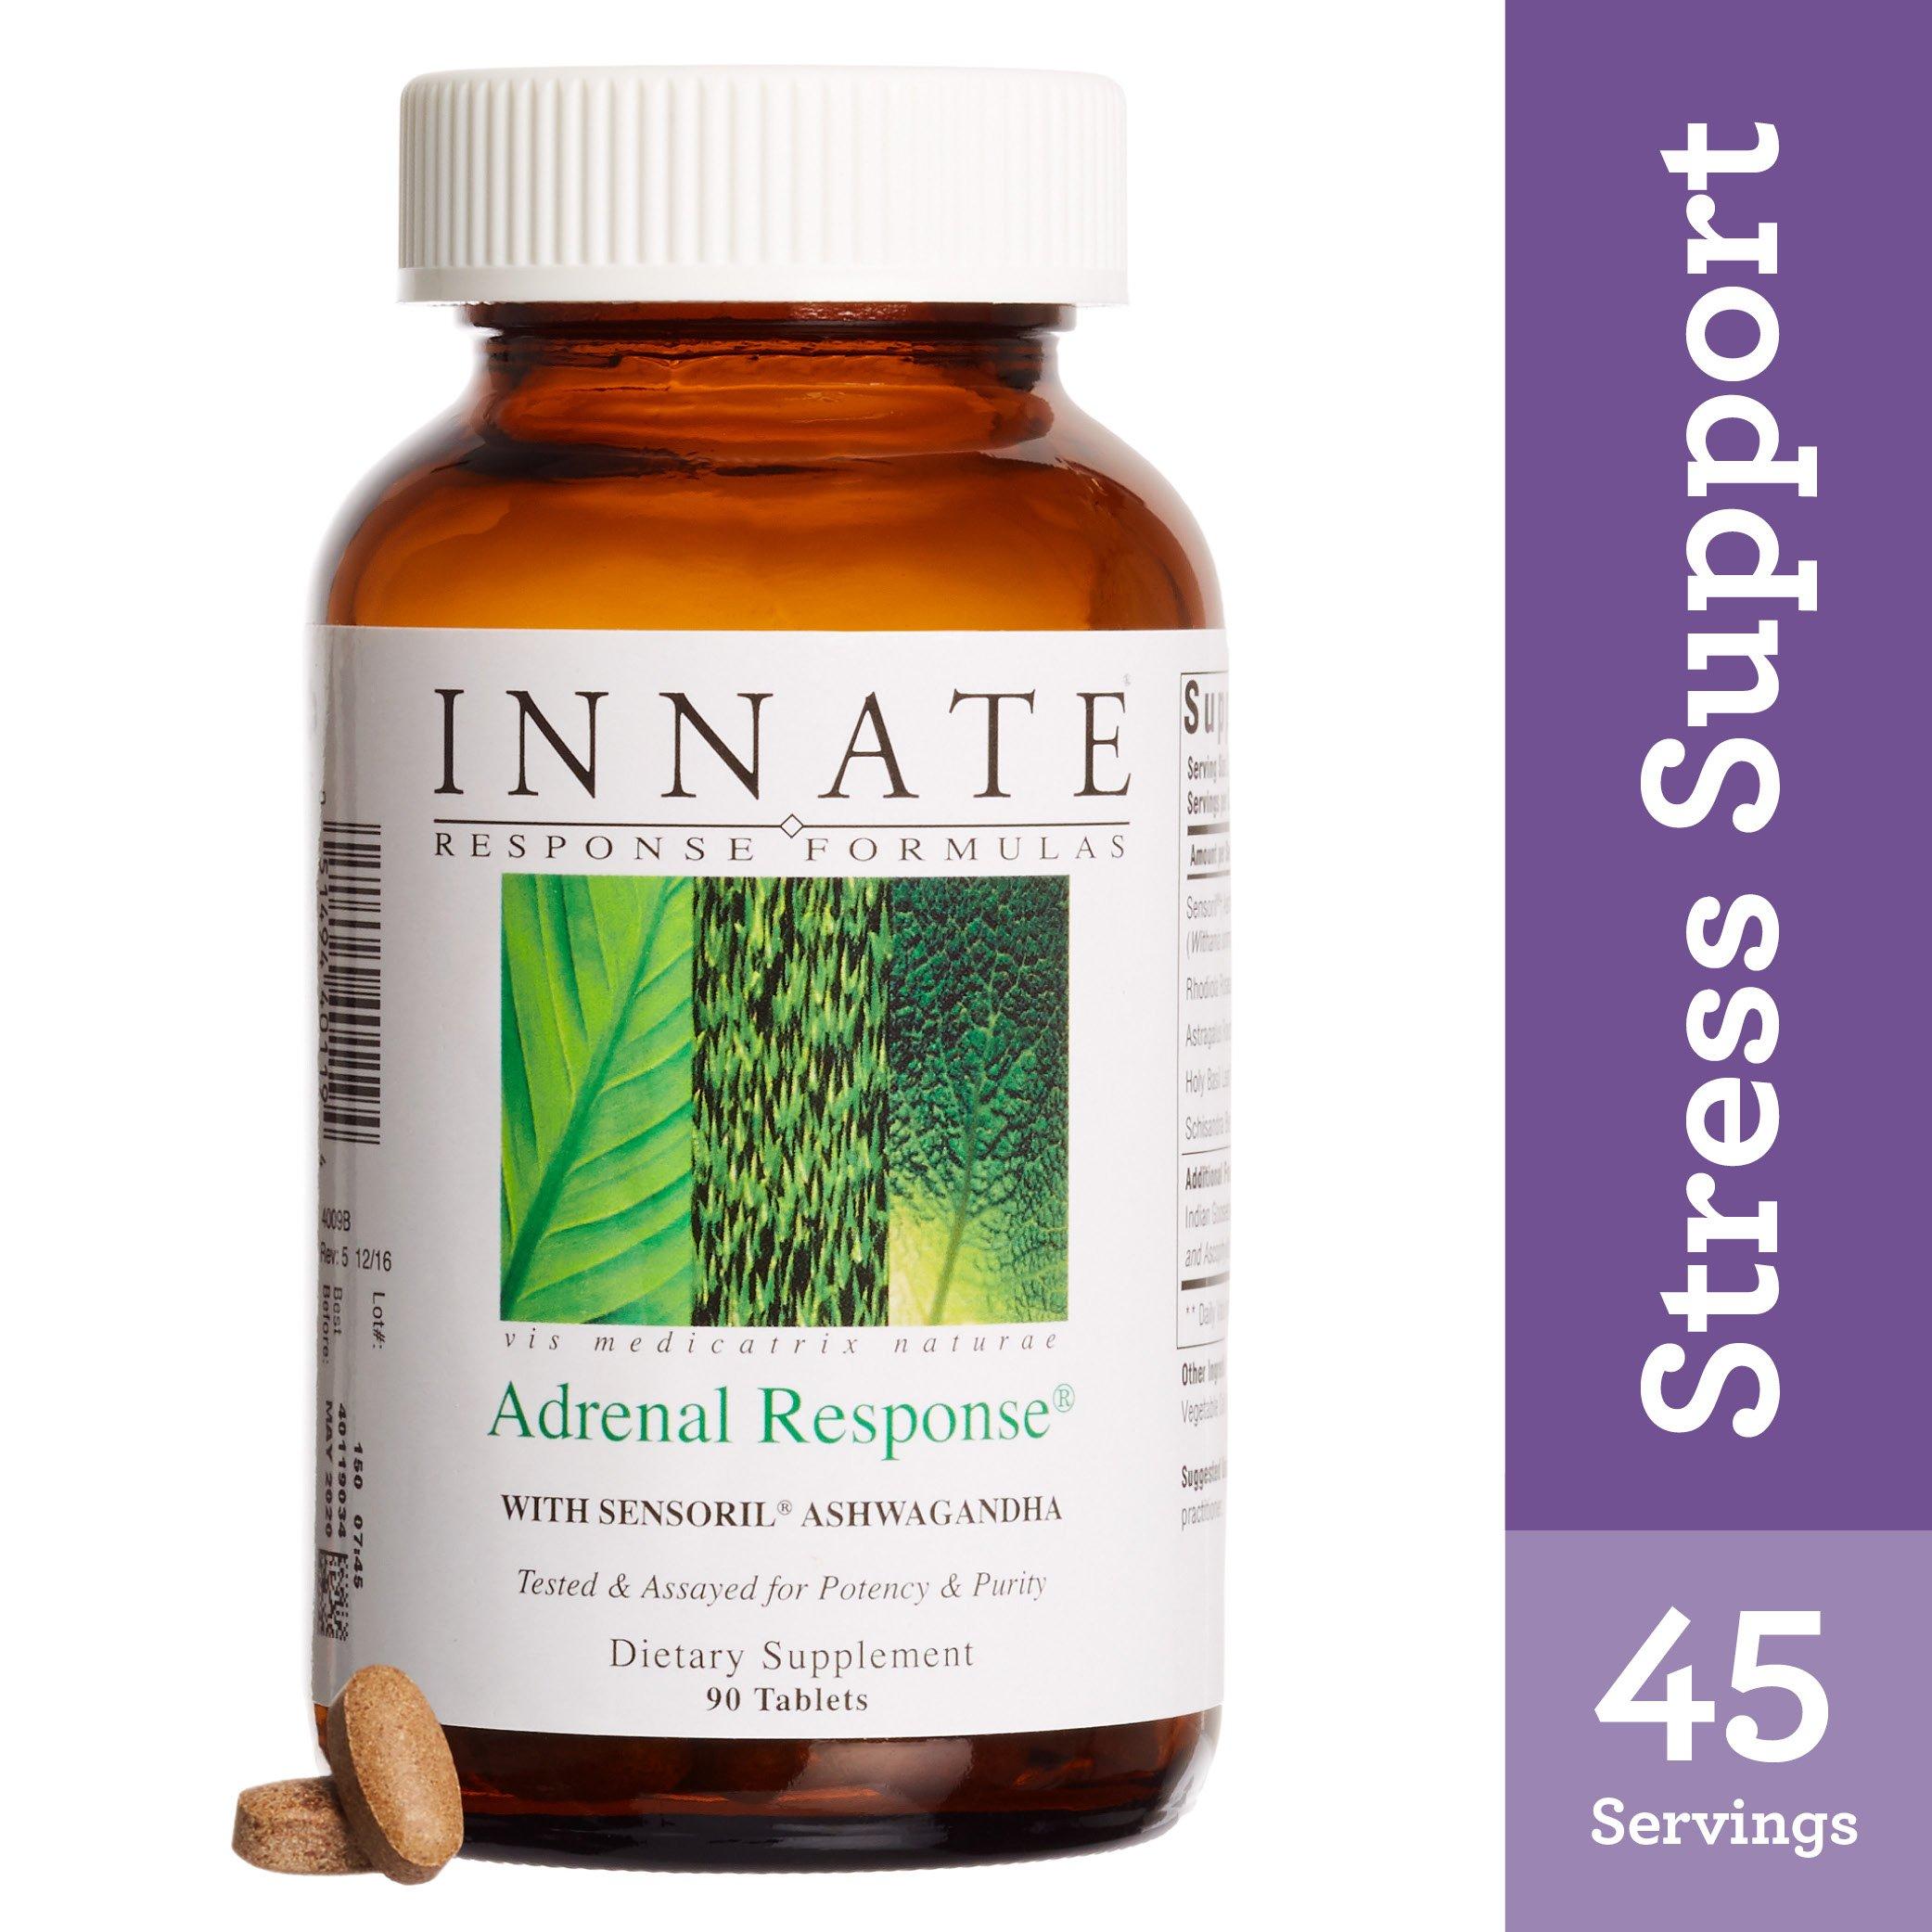 INNATE Response Formulas - Adrenal Response, Sensoril Ashwagandha Supports Response to Stress and Fatigue, 90 Tablets